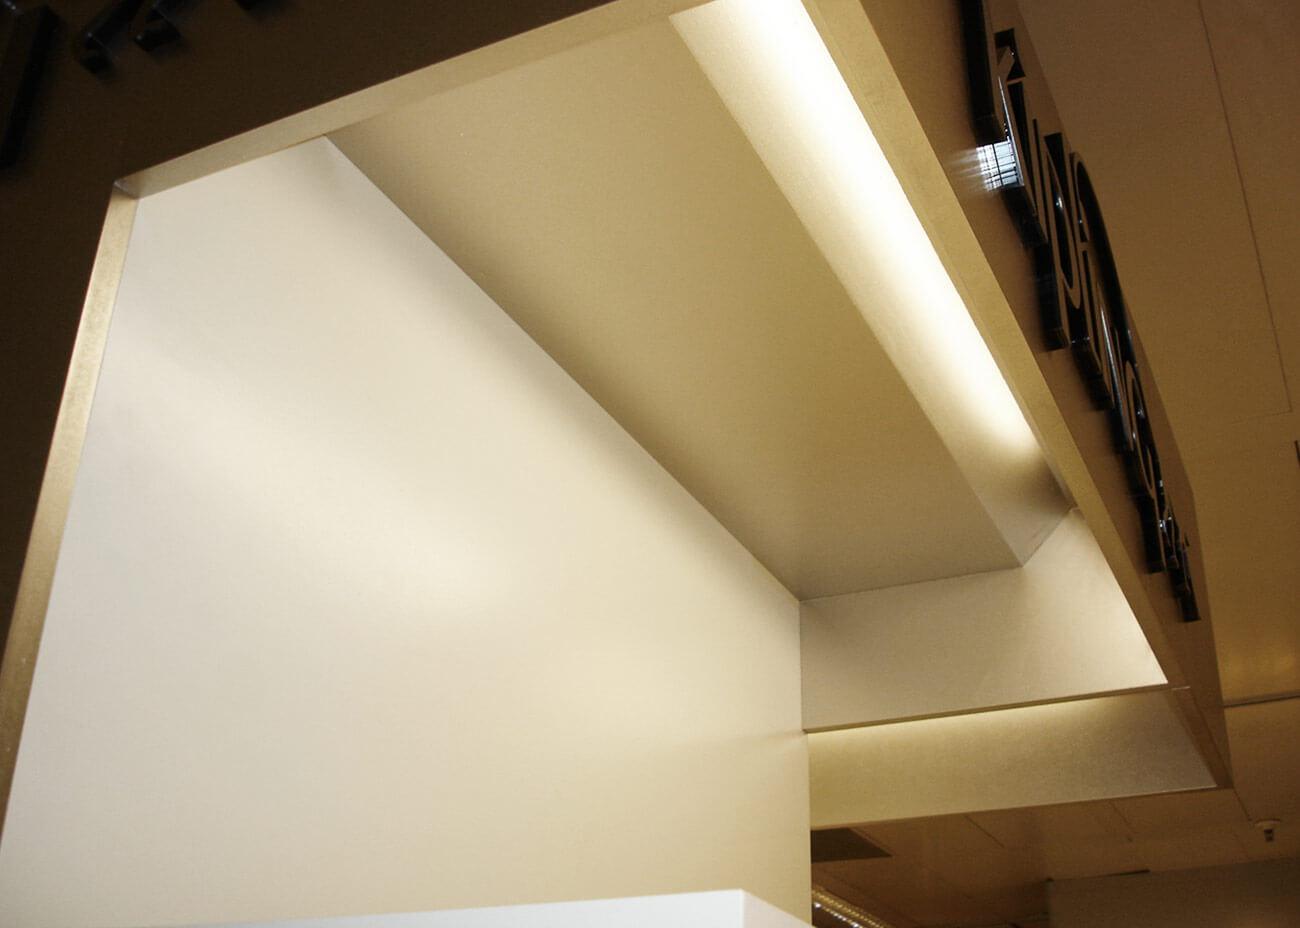 kipling-img07-caad-retail-design-barcelona-Recuperado